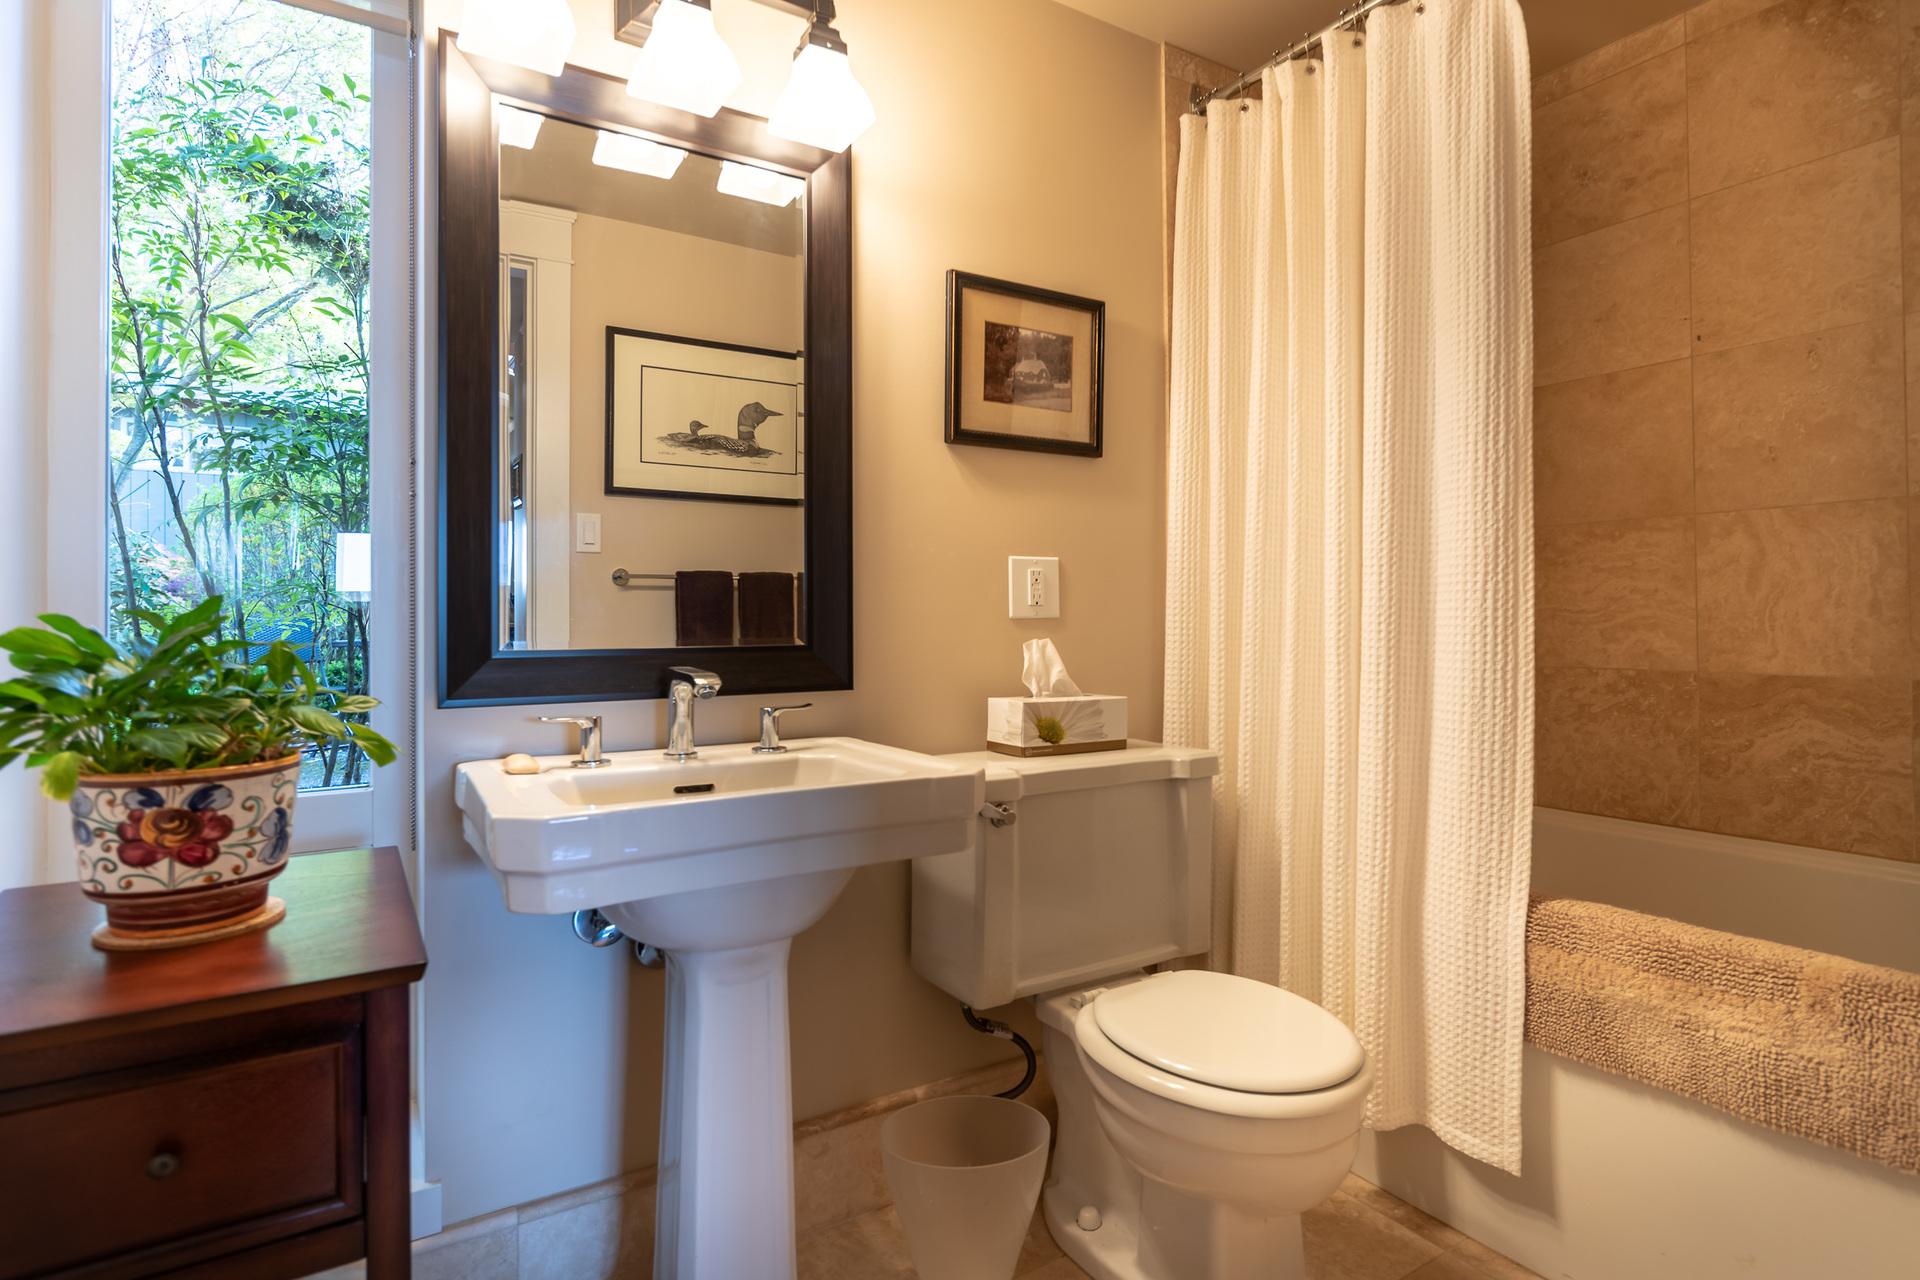 Guest House Bathroom at 4855 Major Road, Cordova Bay, Saanich East